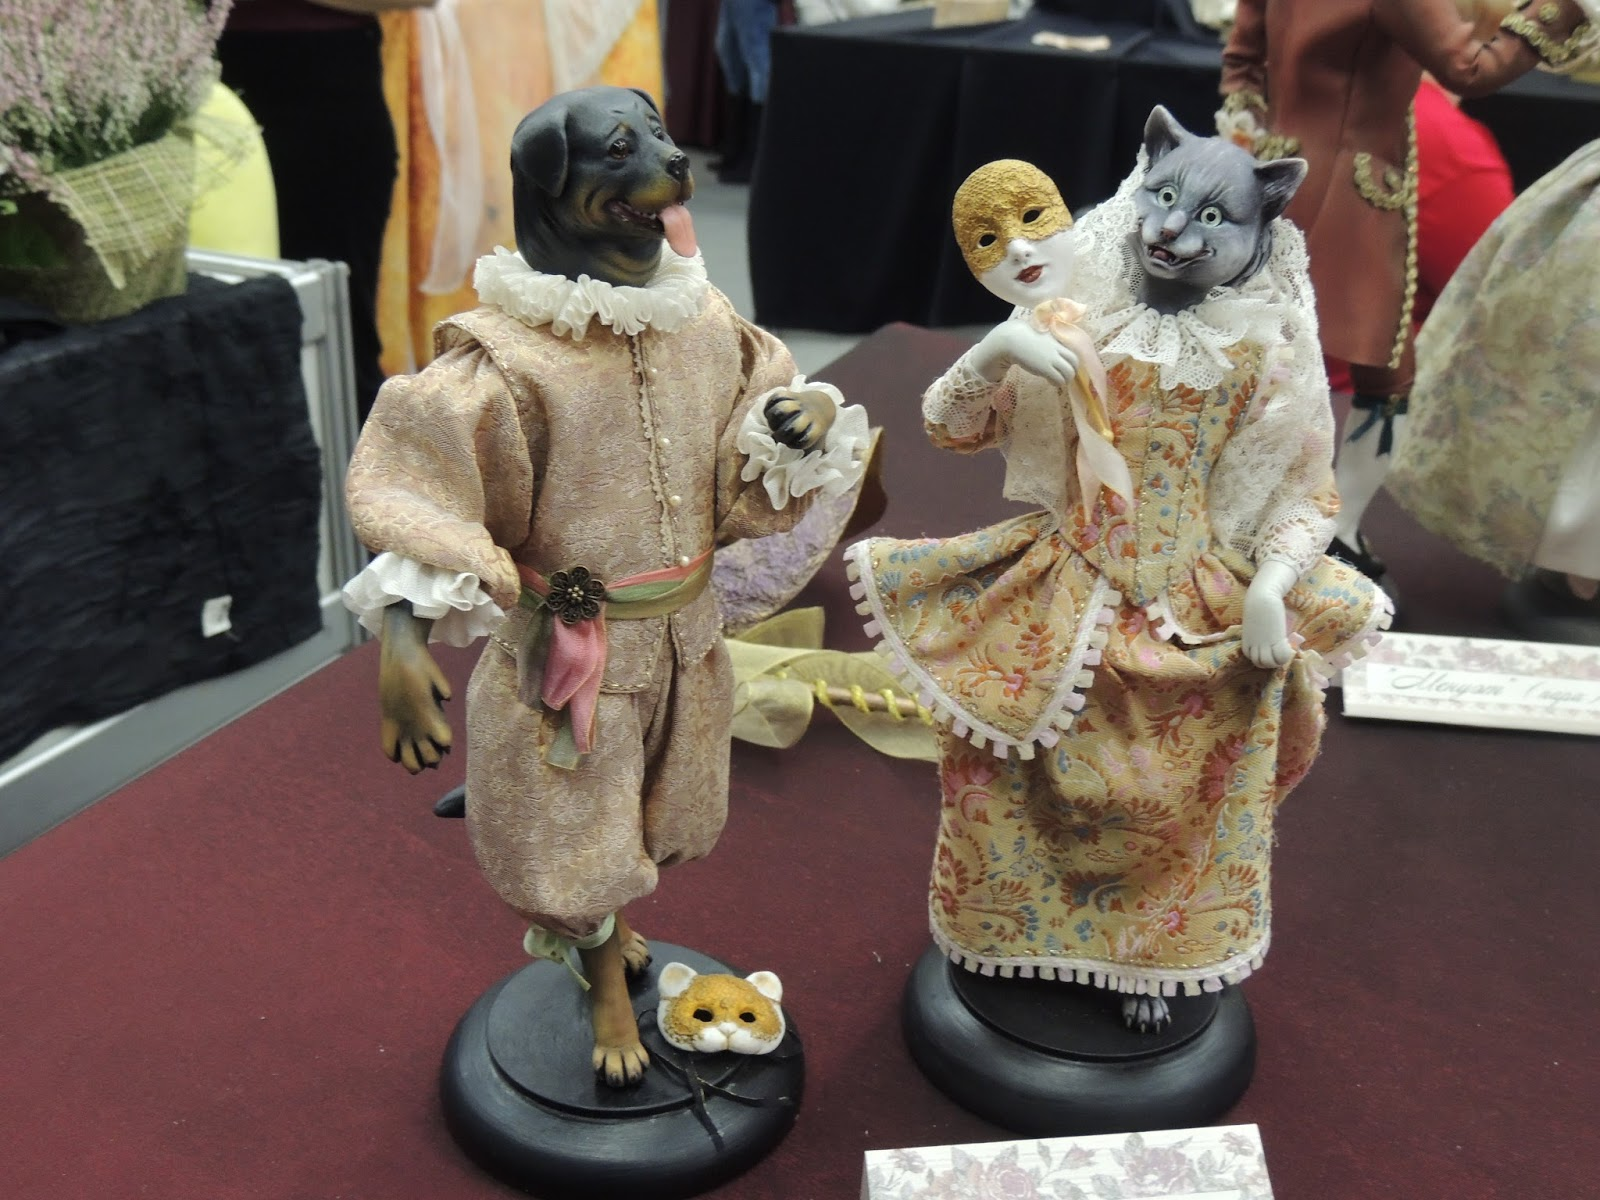 куклы,выставка,тишинка,салон,москва,скульптура